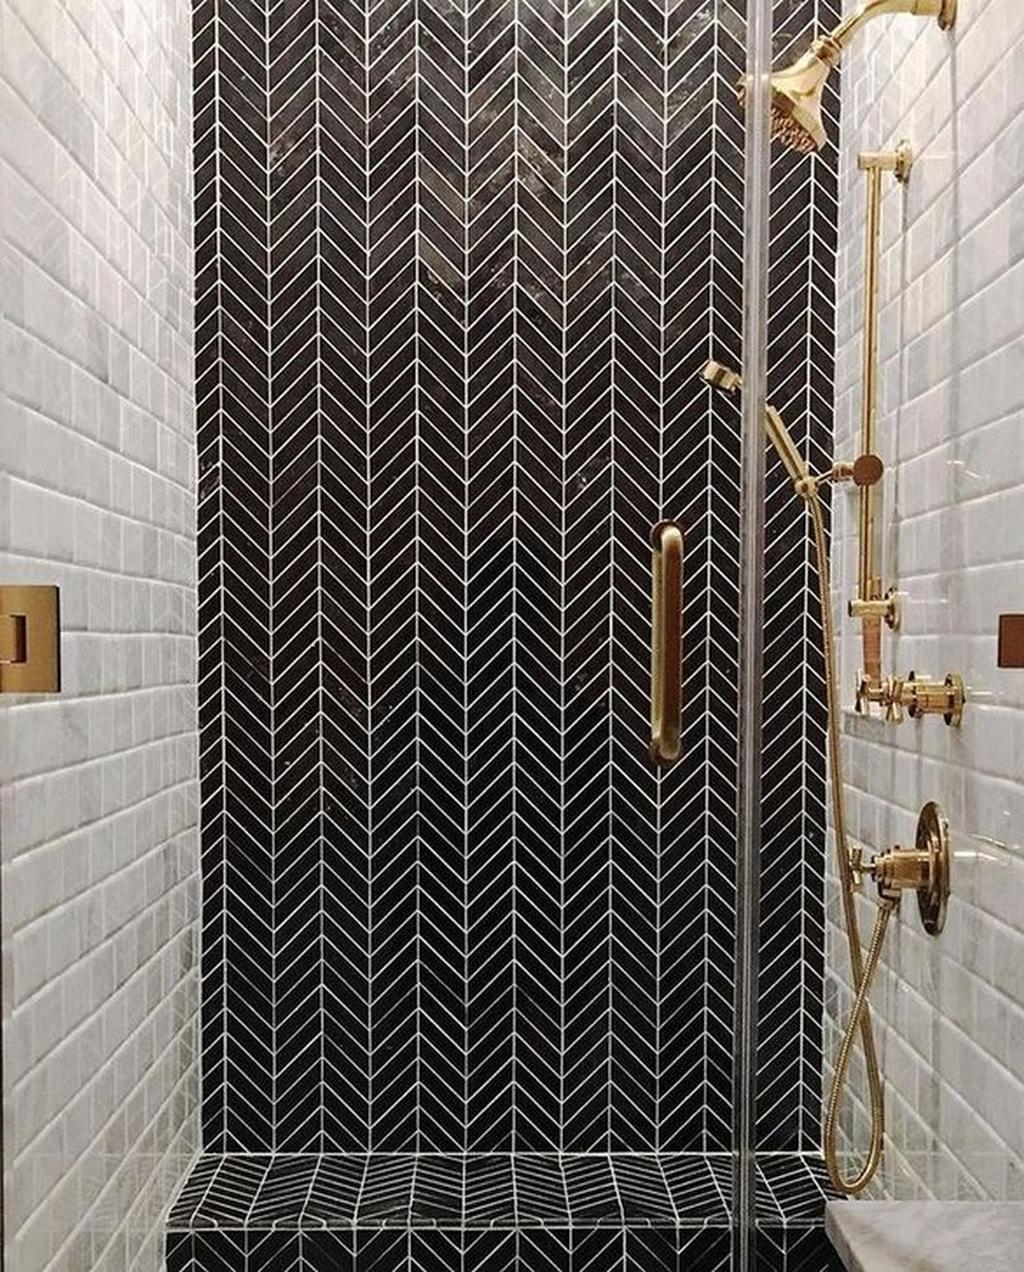 Astonishing Farmhouse Shower Tile Decor Ideas To Try 43